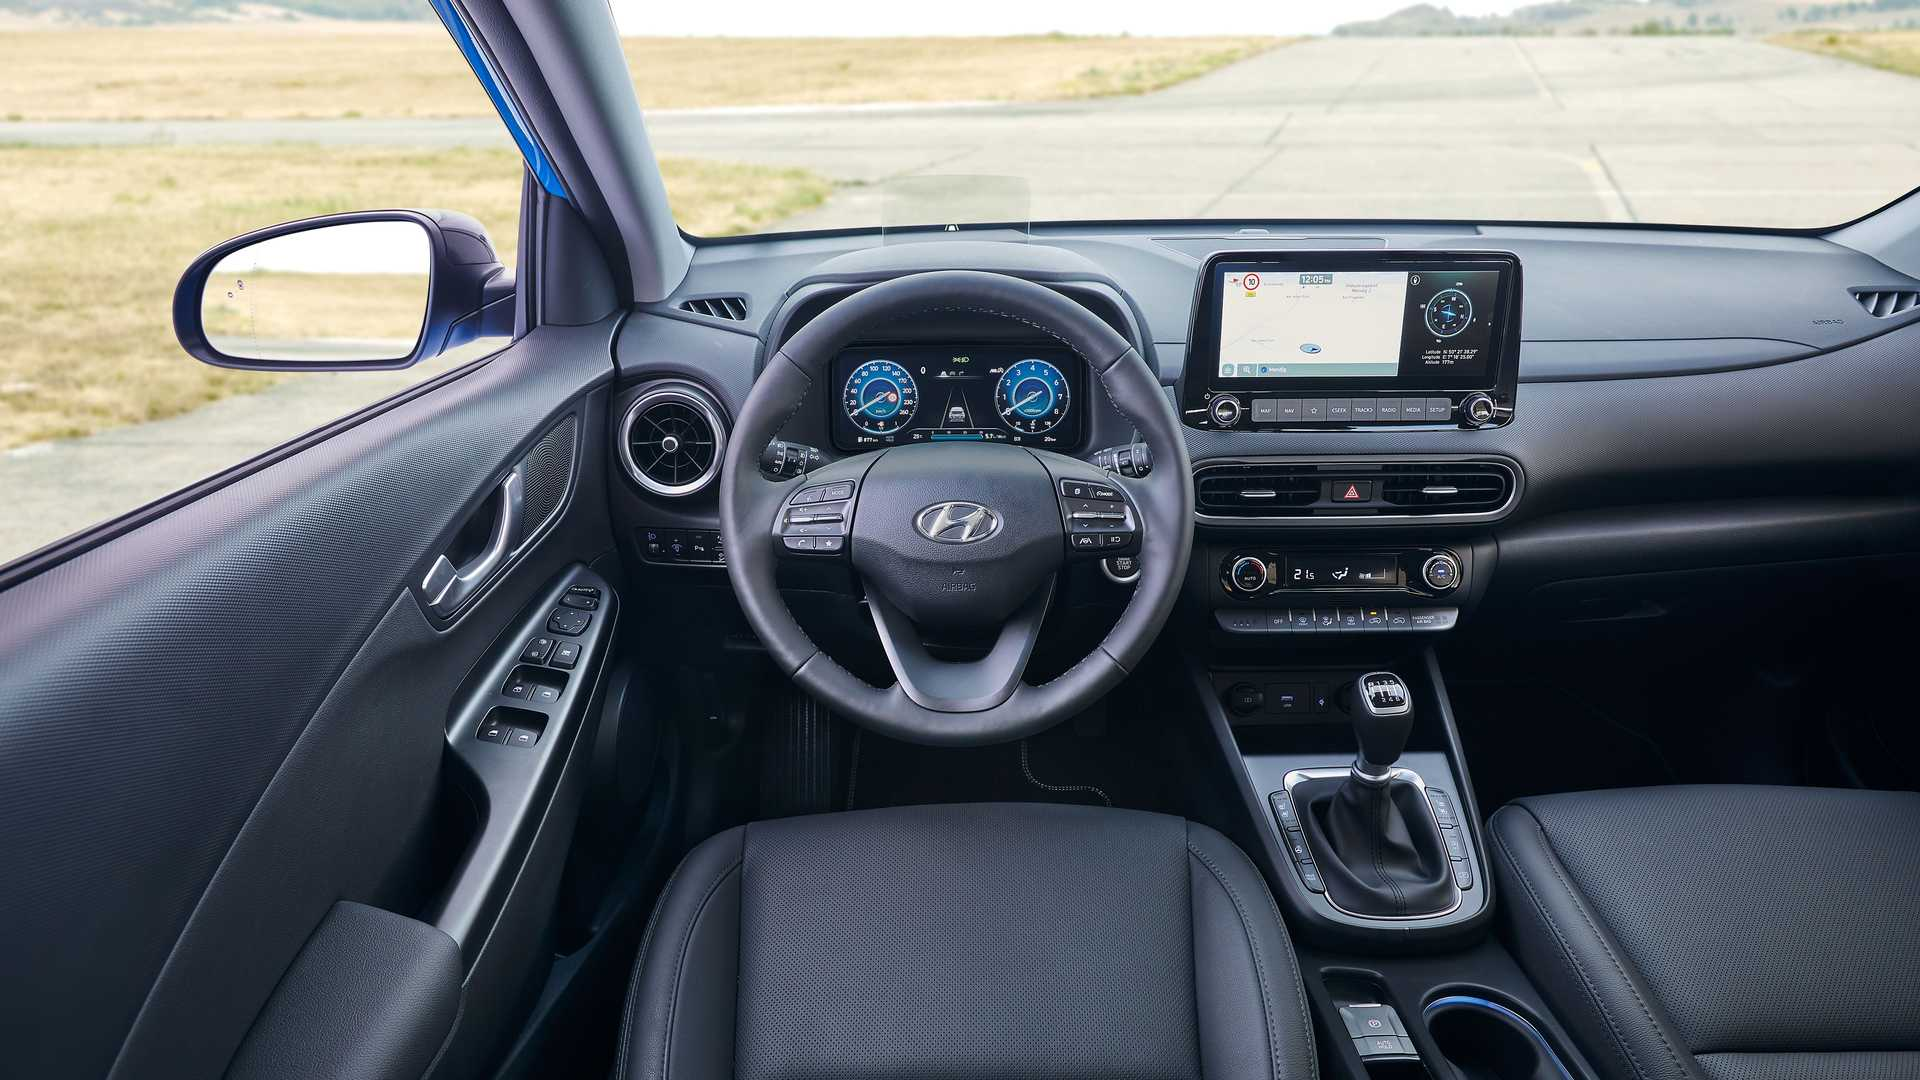 Hyundai Kona 2021: lifting